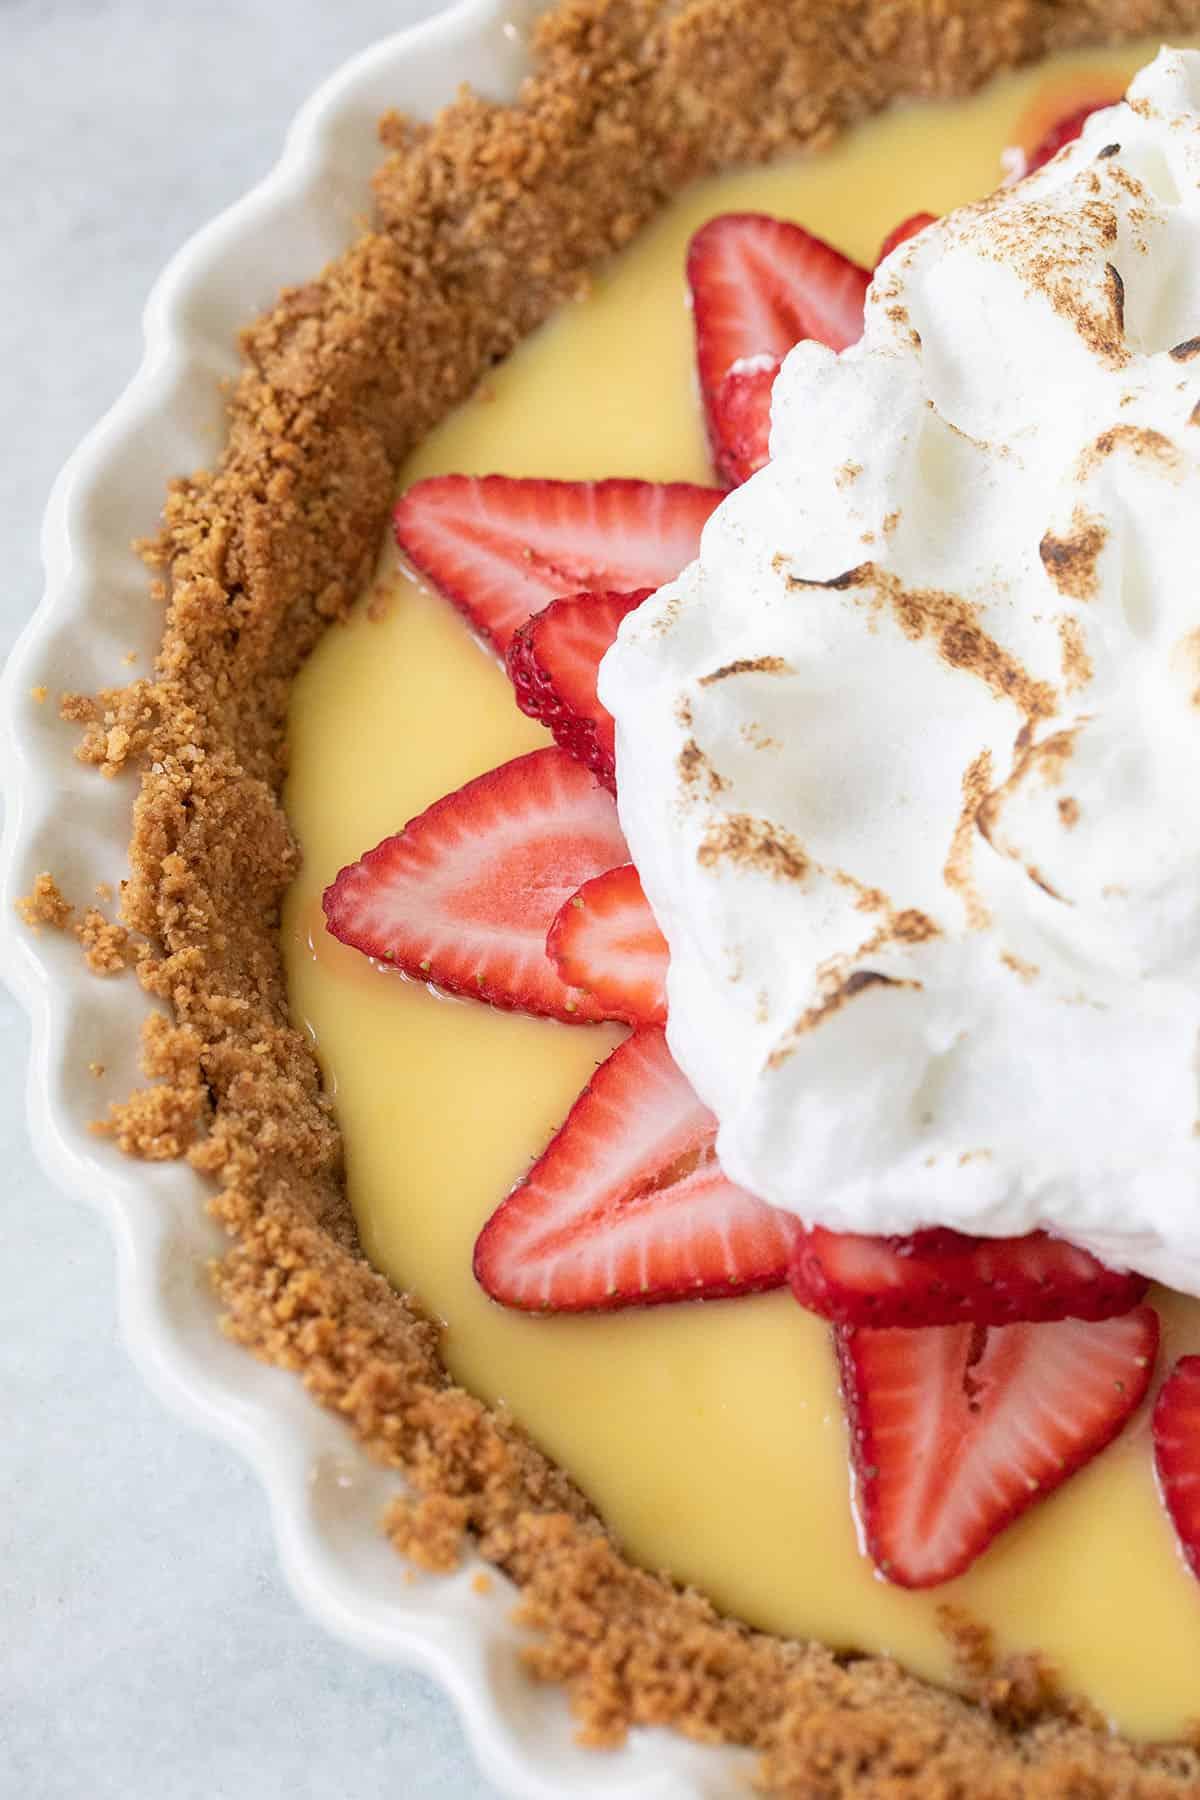 pie recipe with lemons, condensed milk, eggs and strawberries